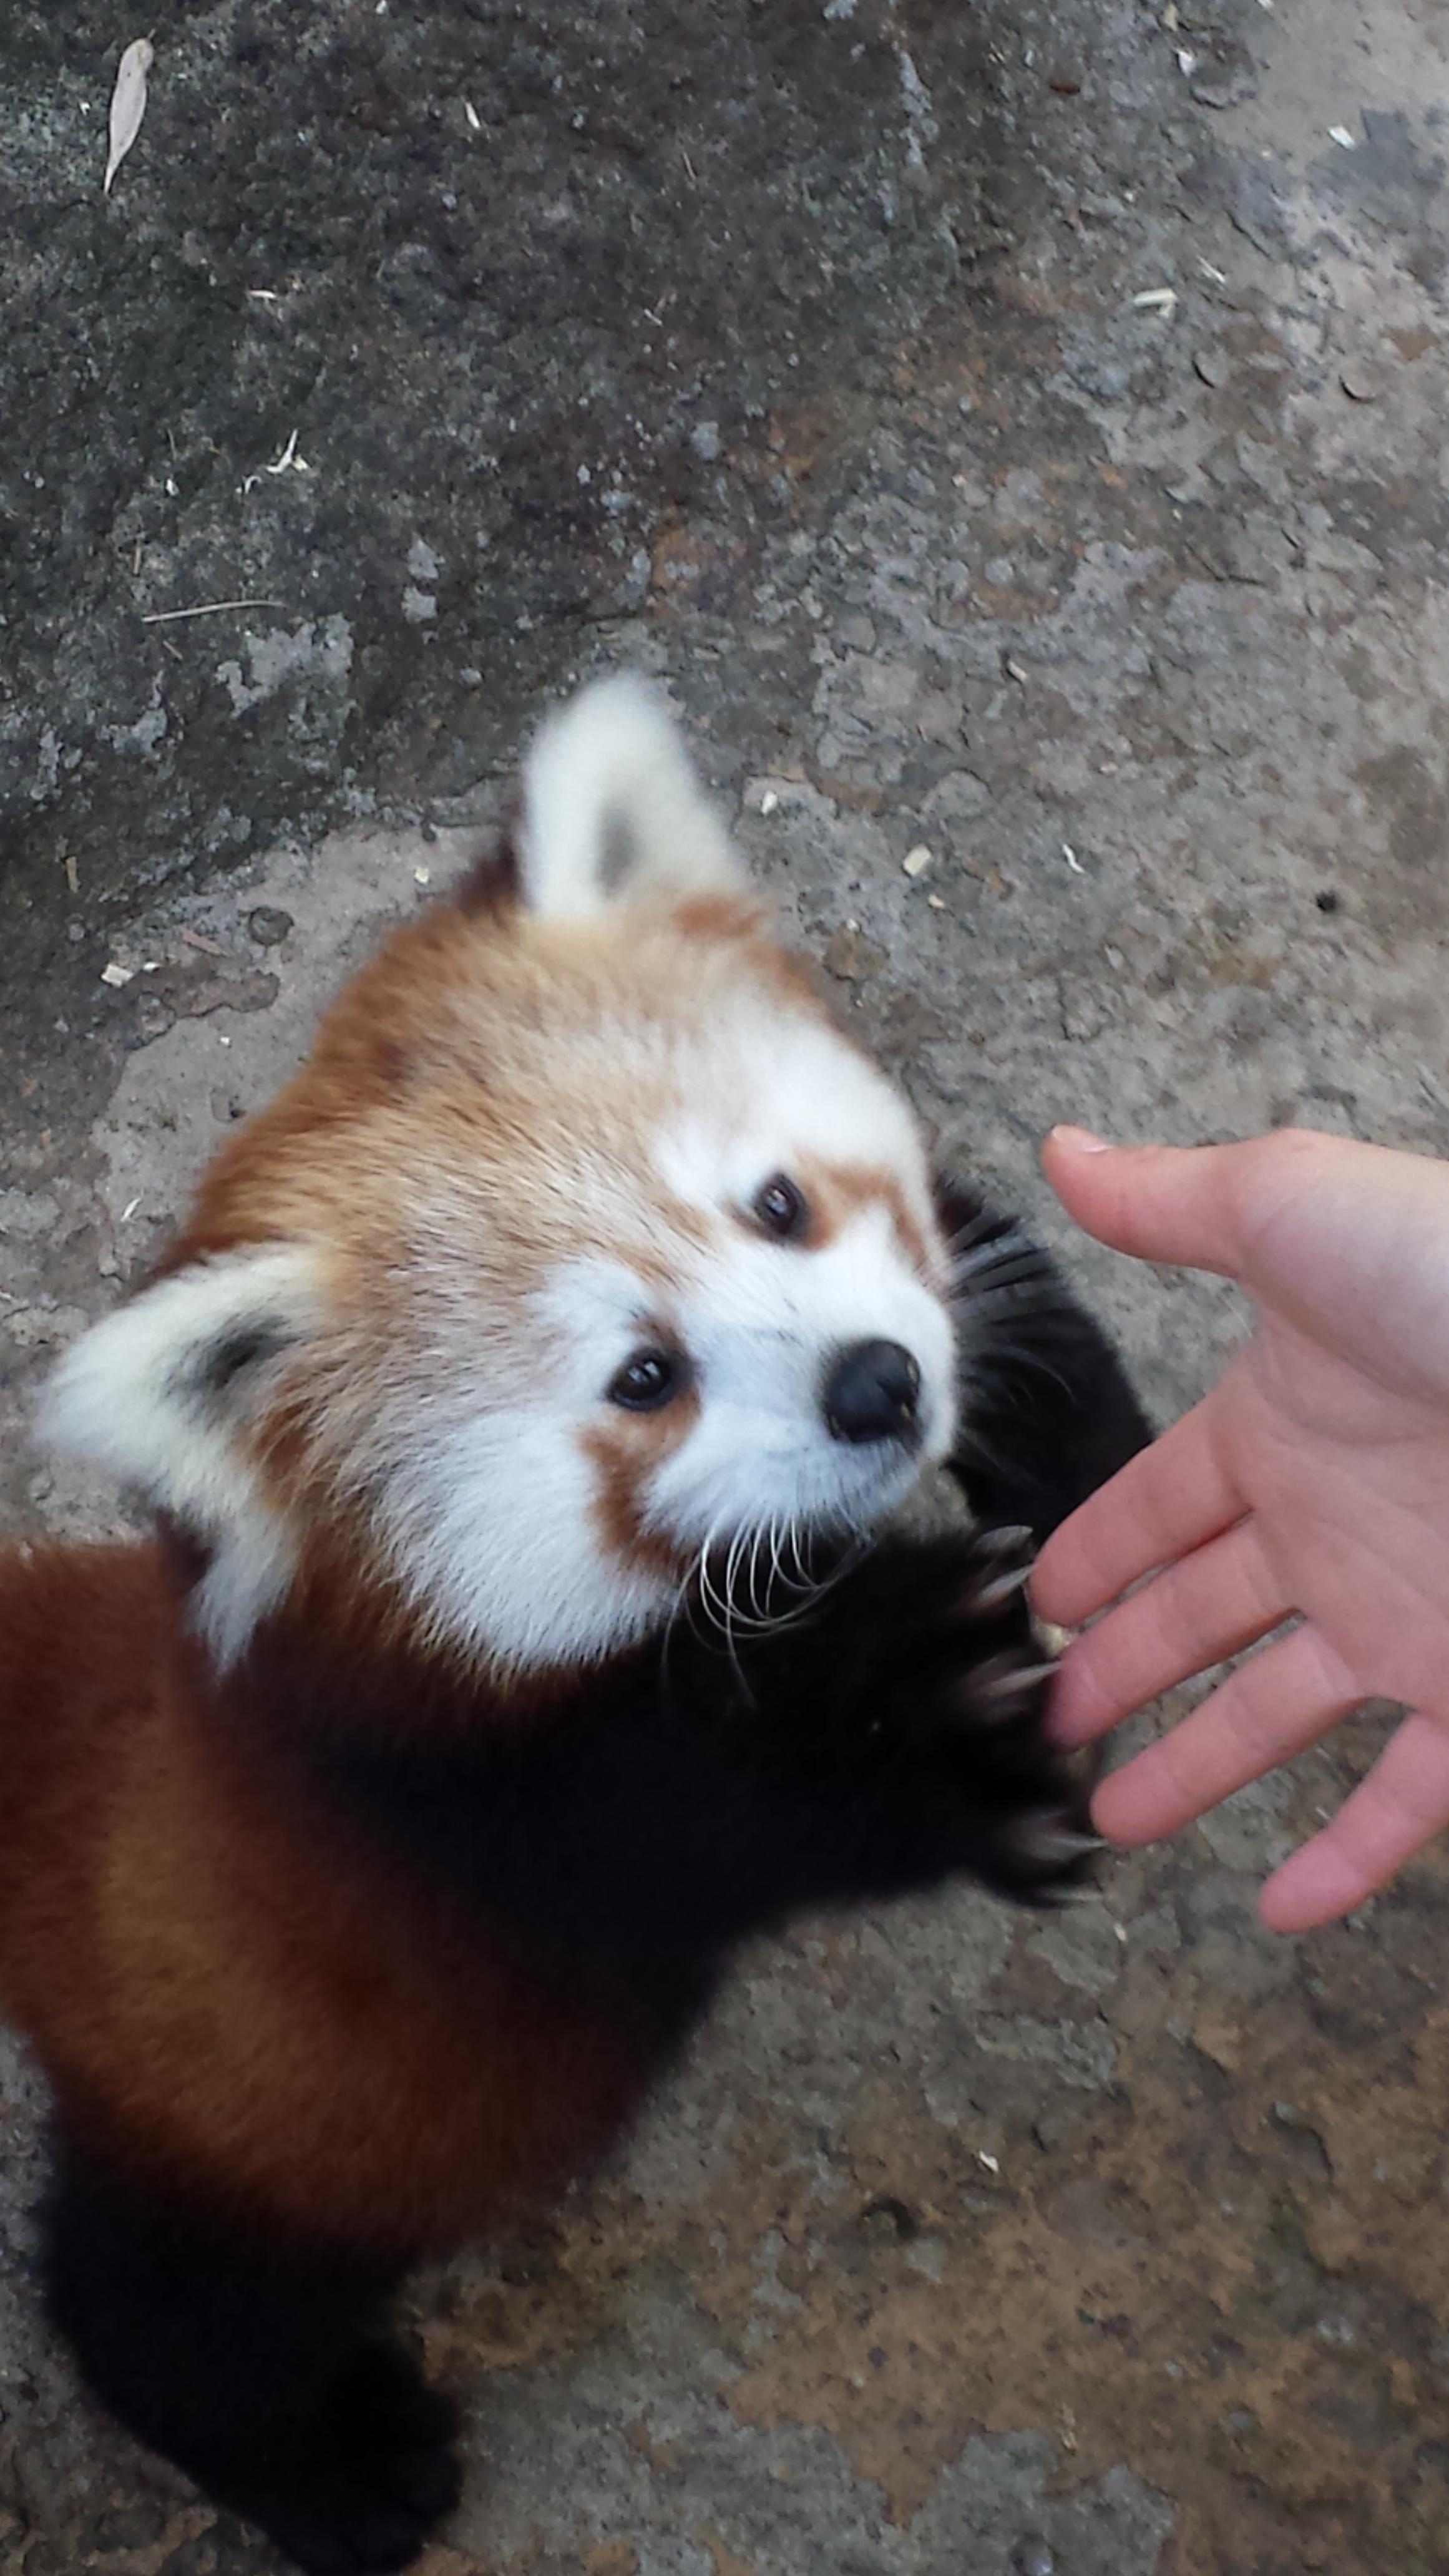 red panda just got - photo #8